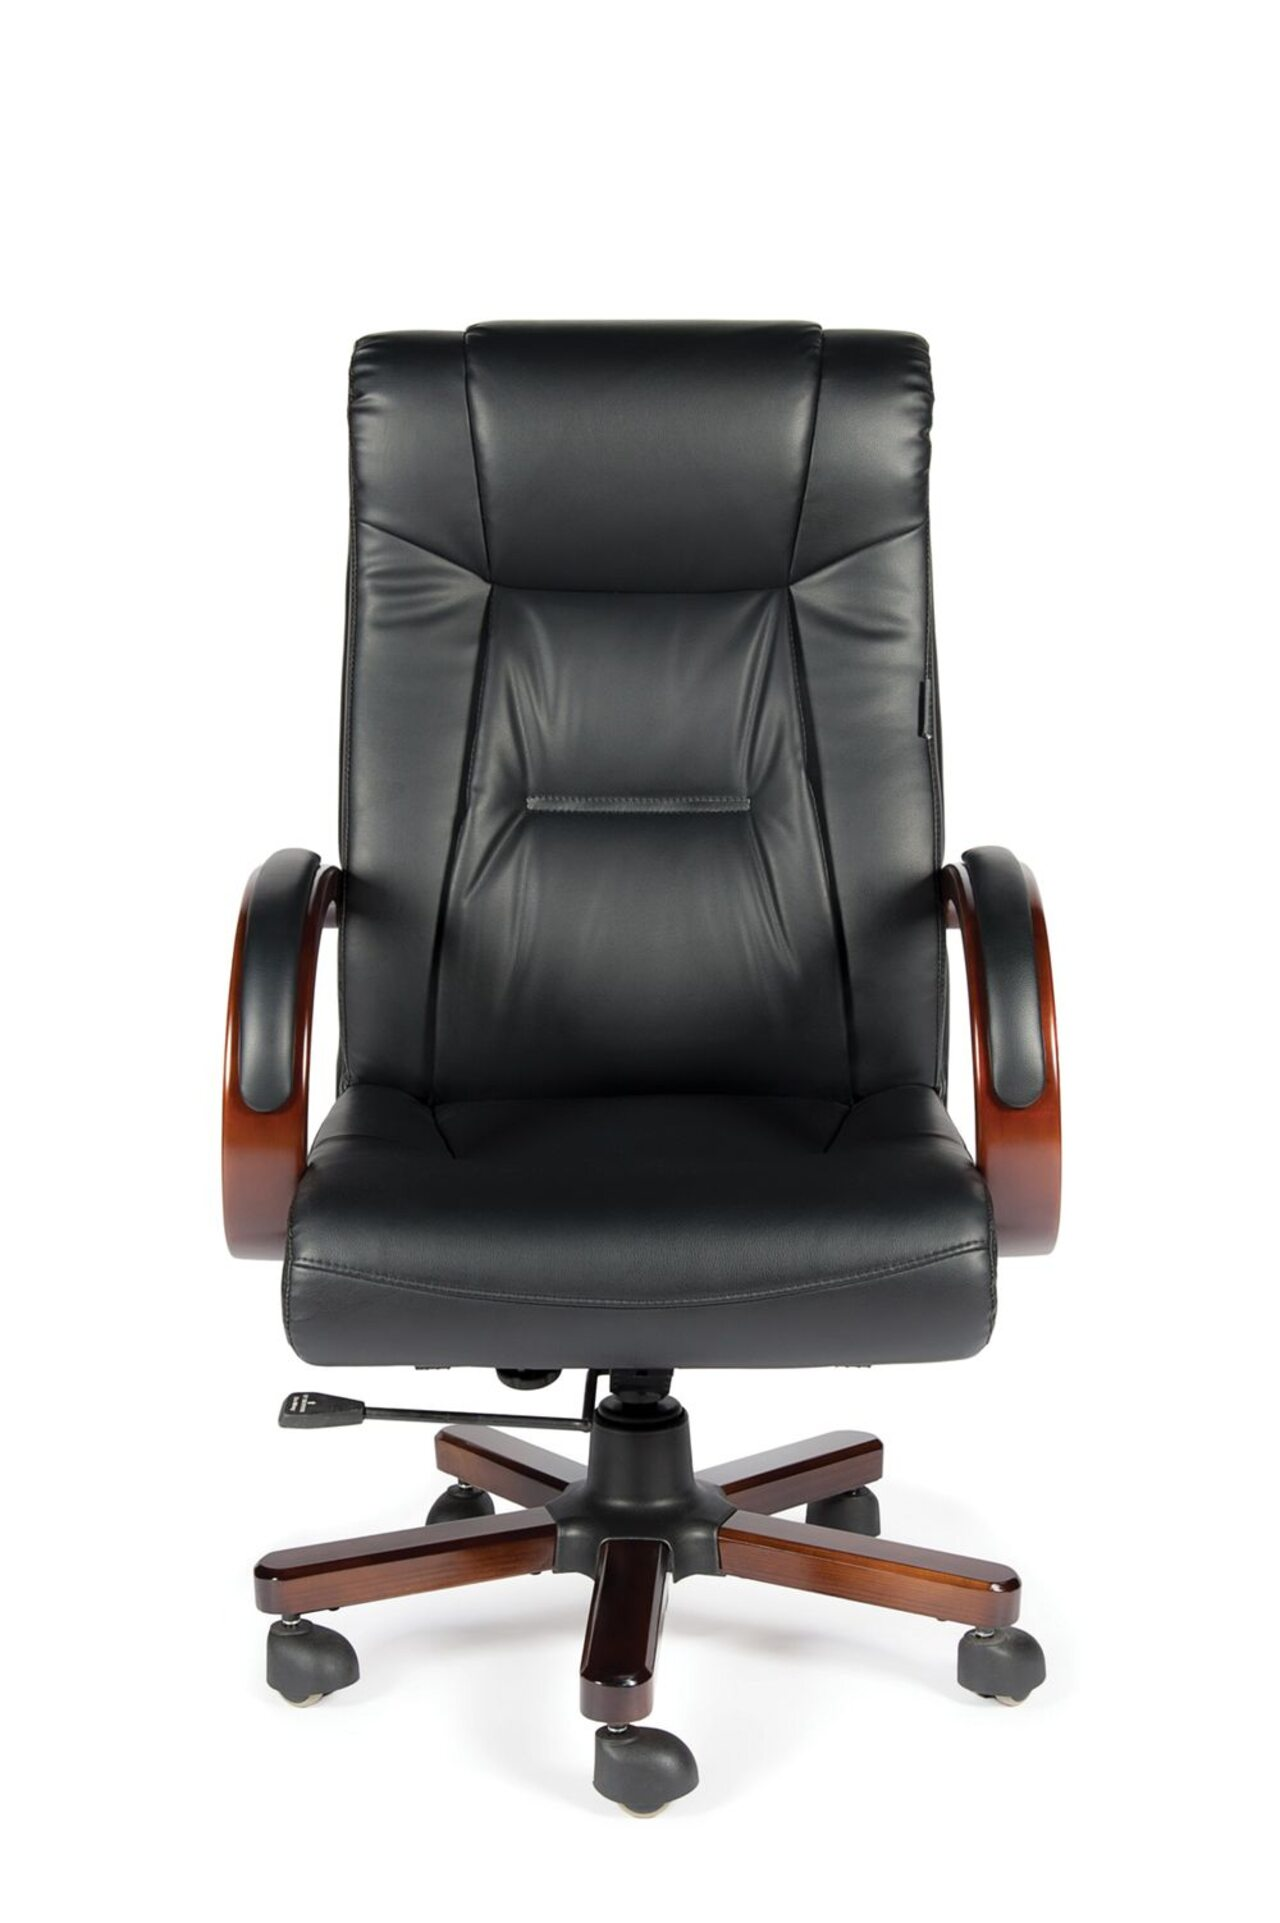 Кресло руководителя Консул 3158-02 - фото 4